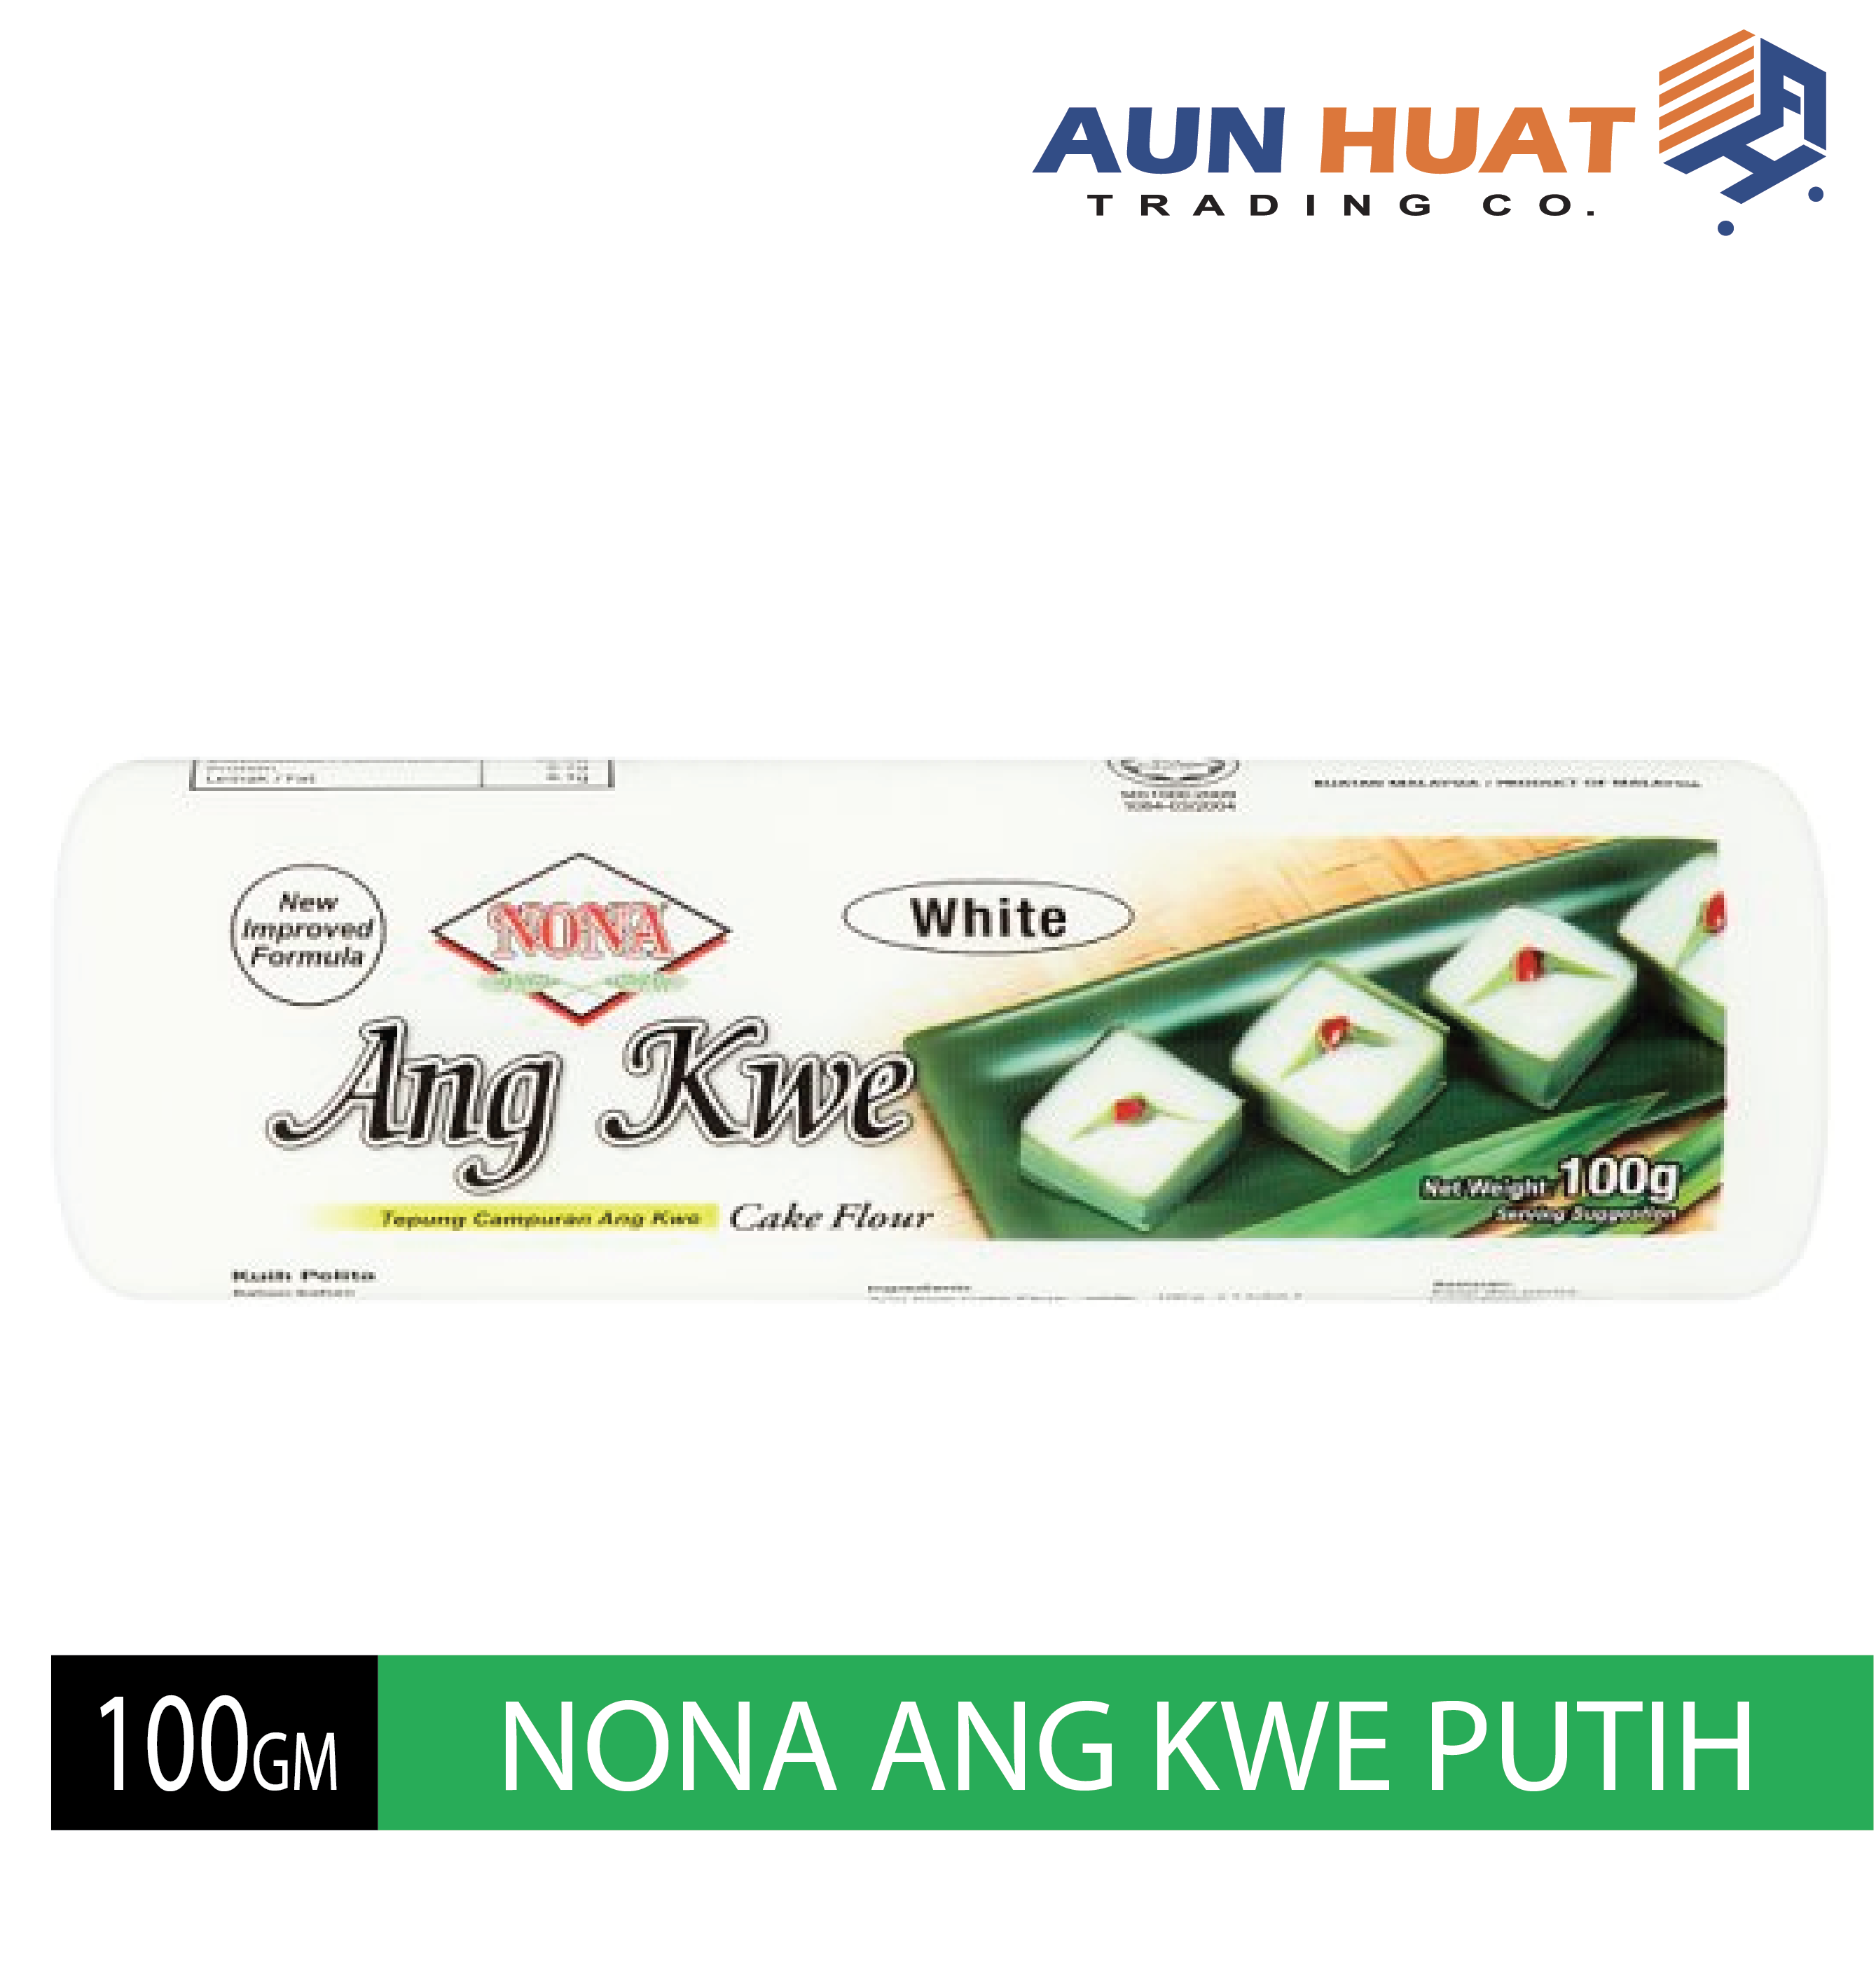 NONA ANG KWE /HOEN KWE 100GM PUTIH